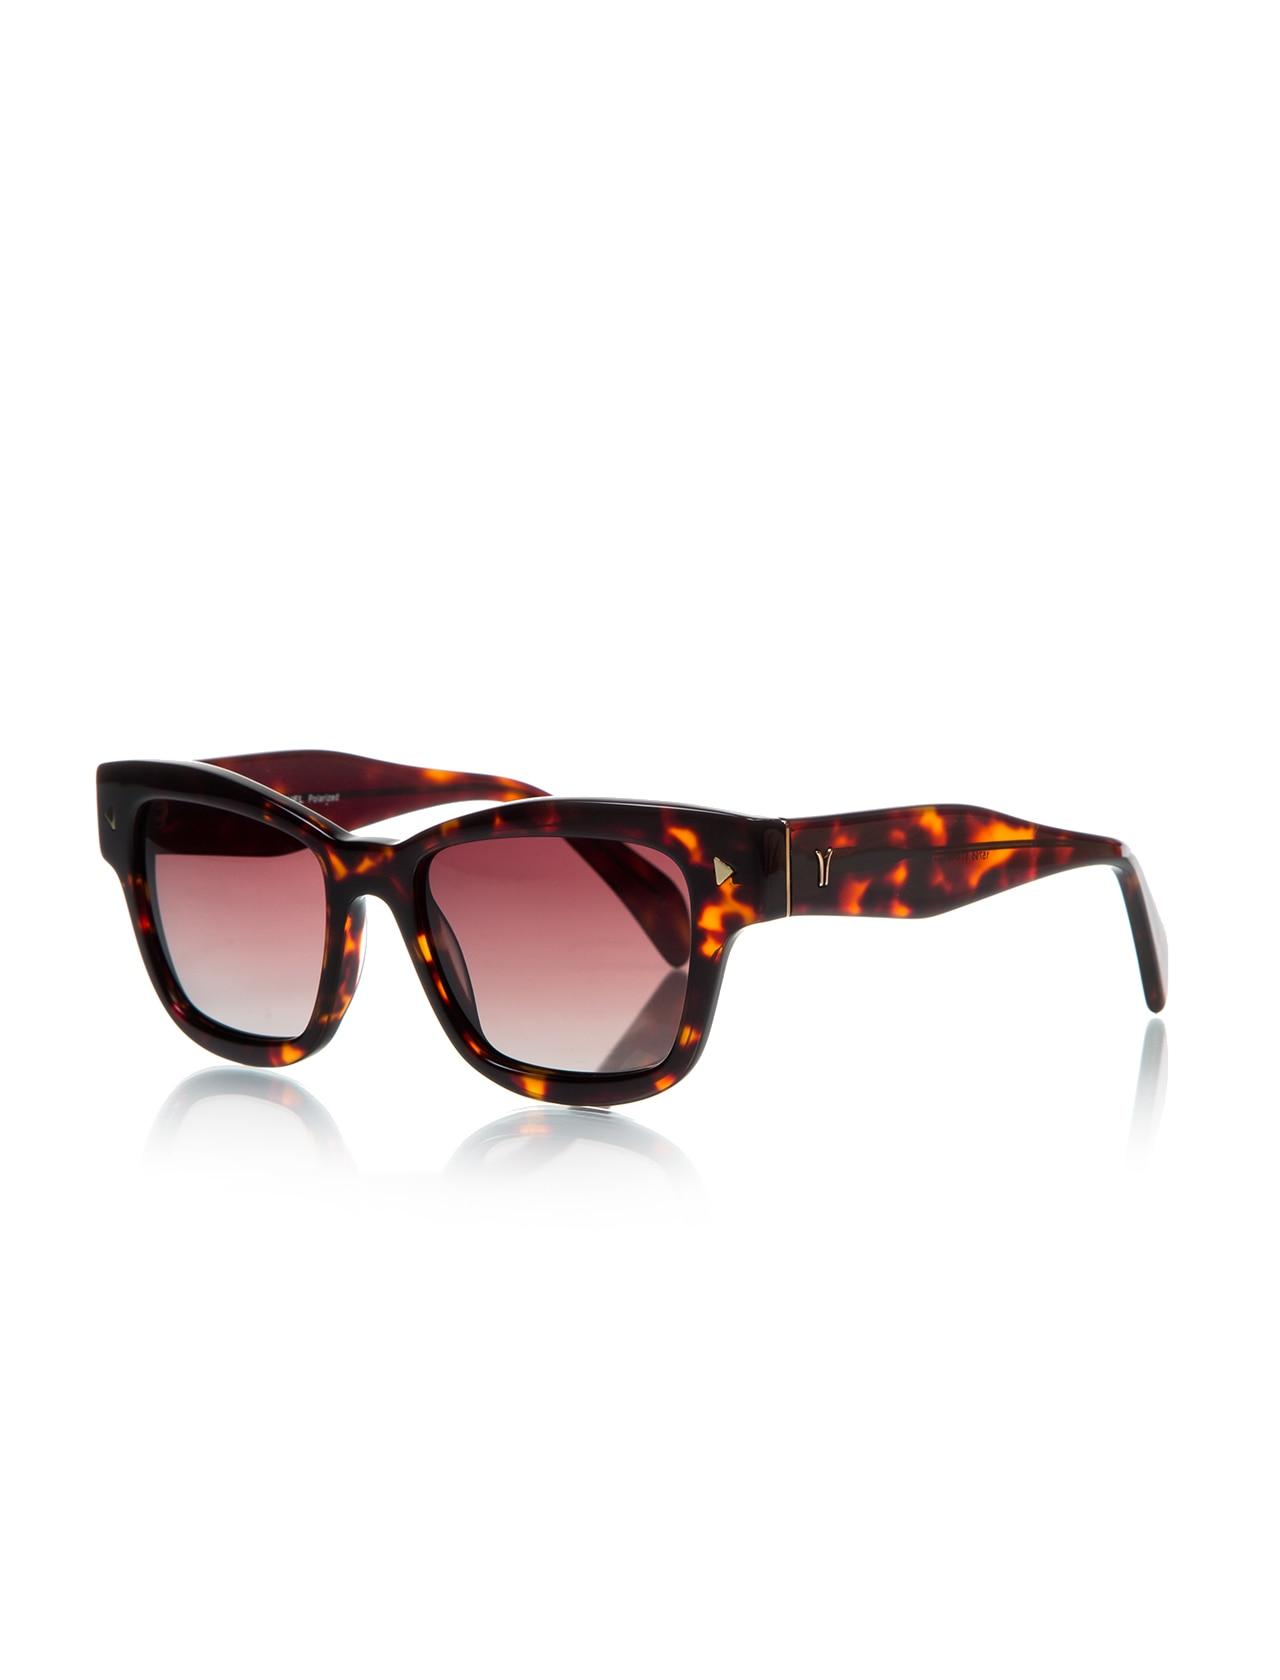 Women's sunglasses rh 15795 04 bone black organic square square 53-19-140 rachel